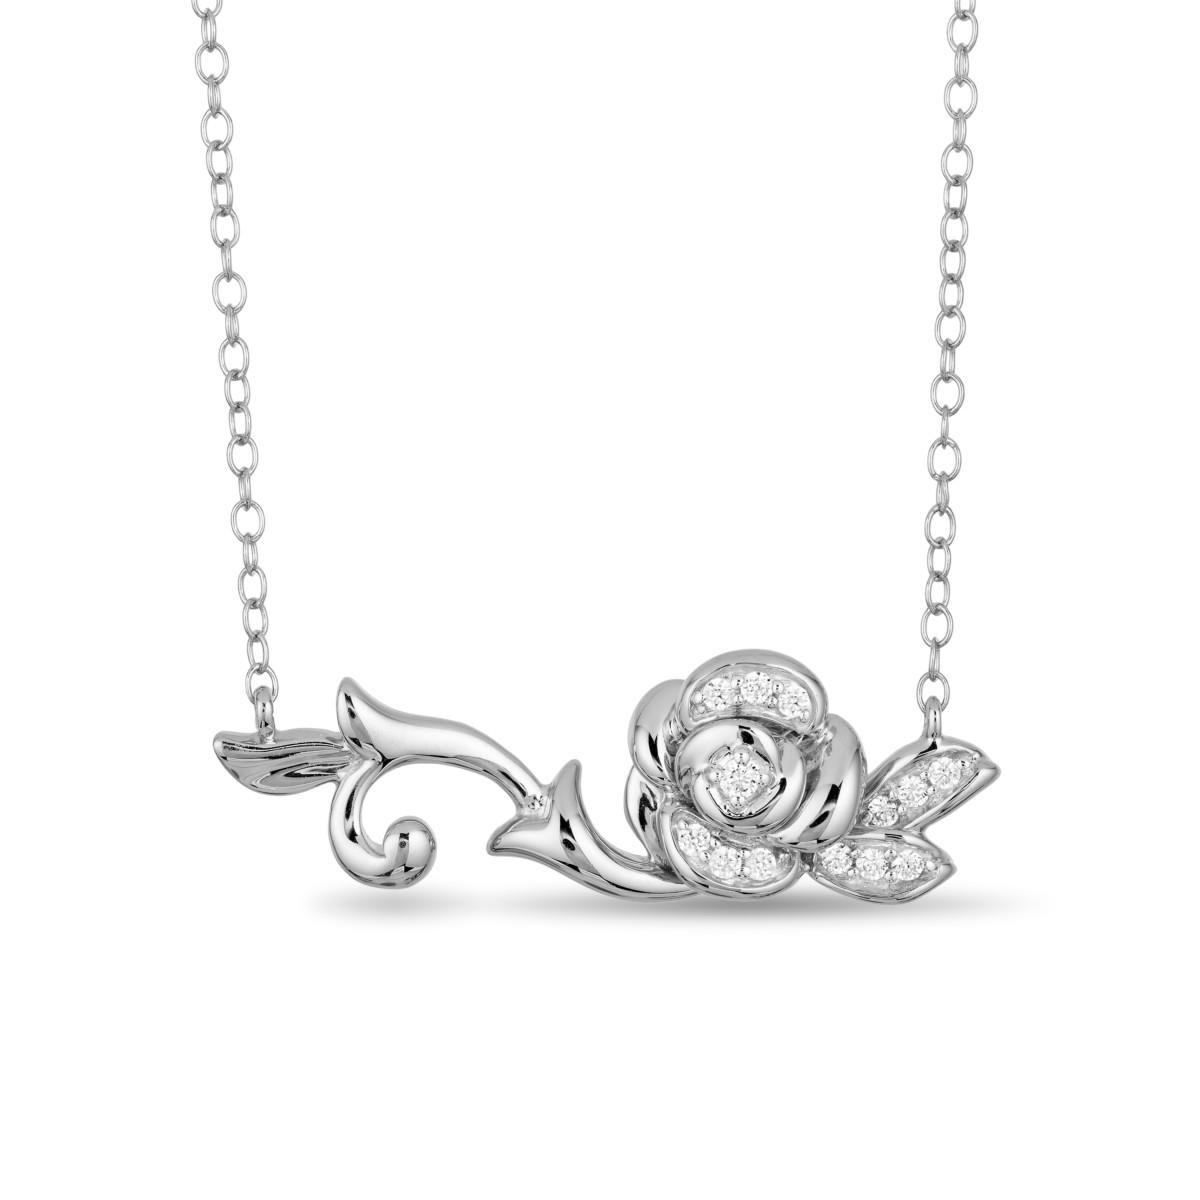 8593205 Enchanted Disney Silver Diamond Belle Necklet £349 at H.Samuel